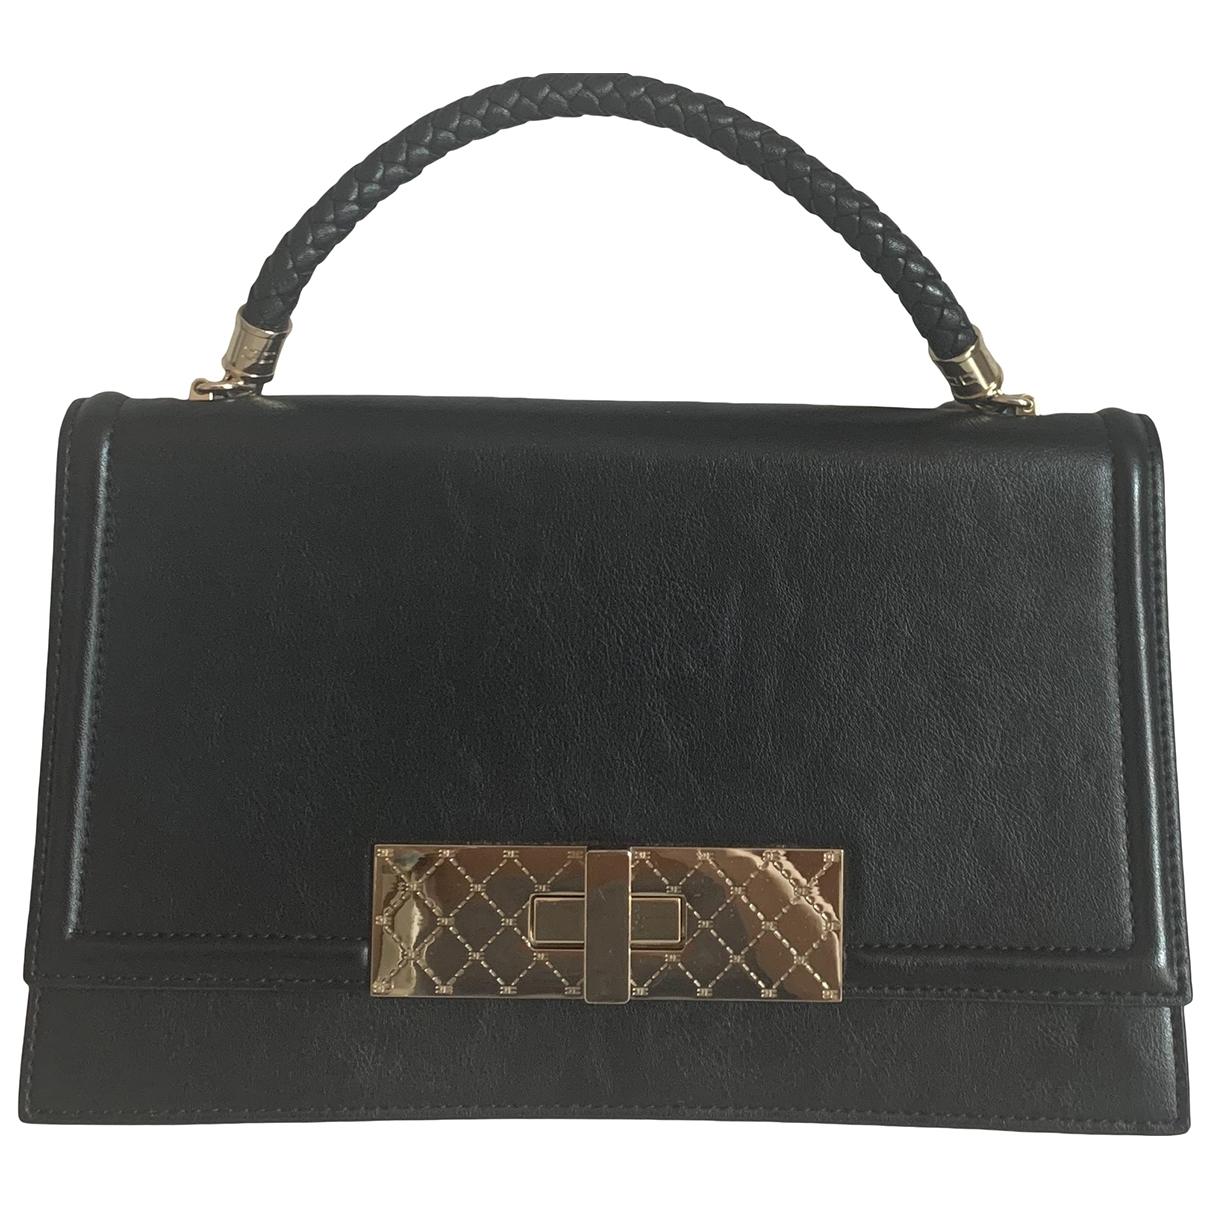 Elisabetta Franchi \N Black Leather handbag for Women \N